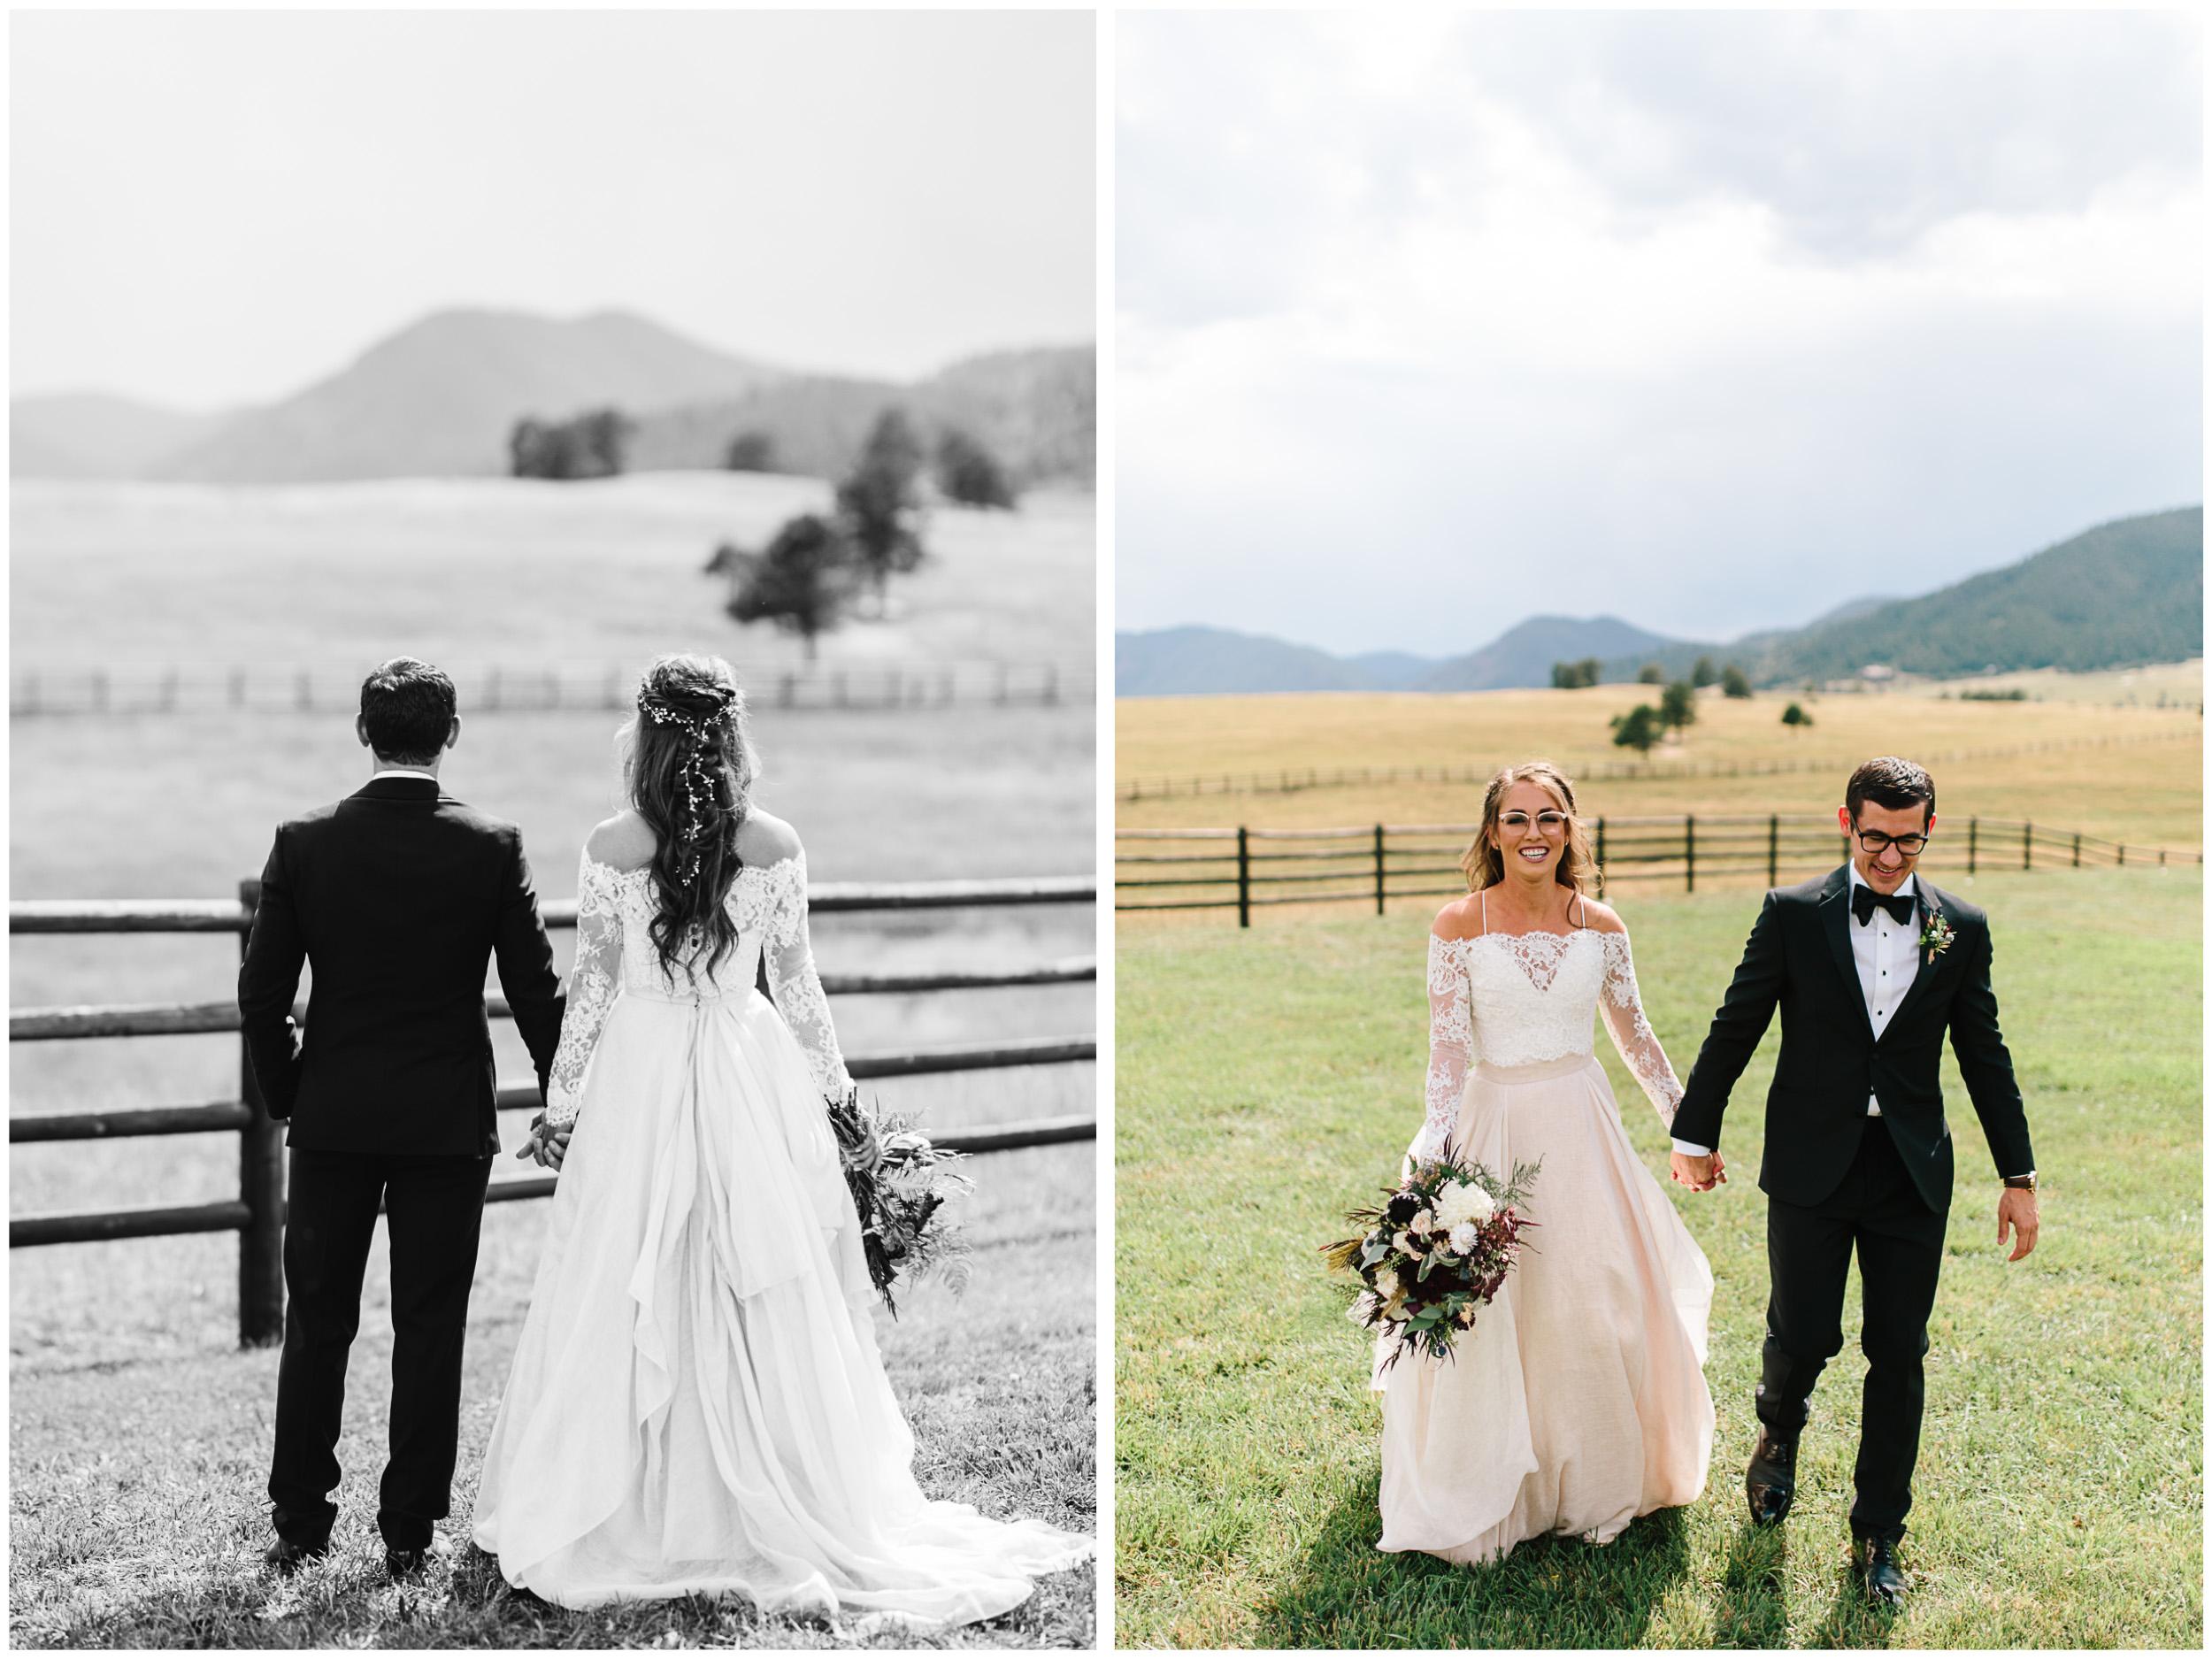 spruce_mountain_ranch_wedding_31.jpg